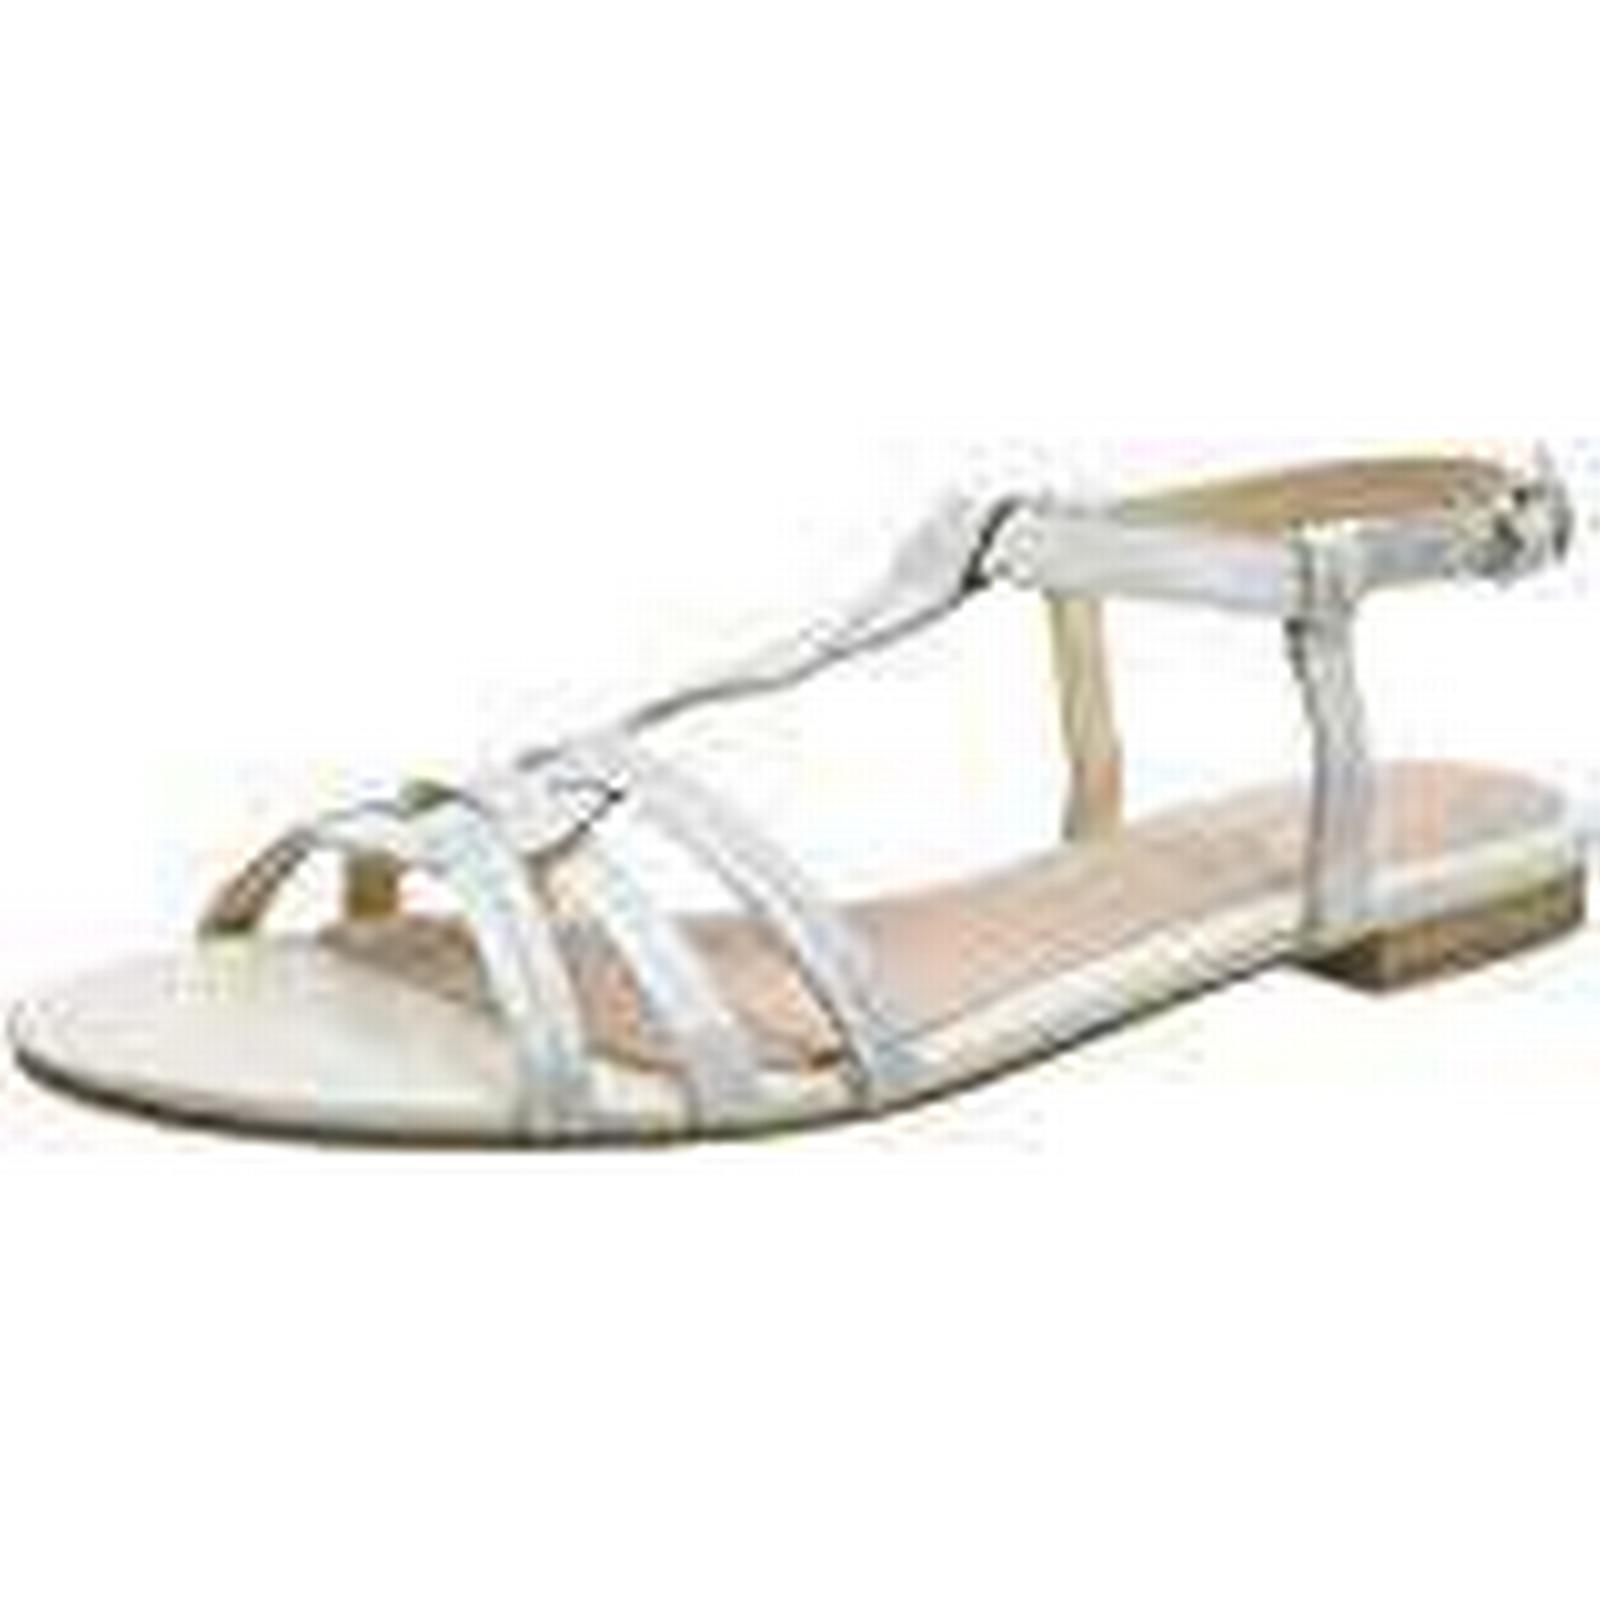 CAPRICE Women's (White 28101 Sling Back Sandals (White Women's Nappa 102), 5.5 UK 5.5 UK 0929a9